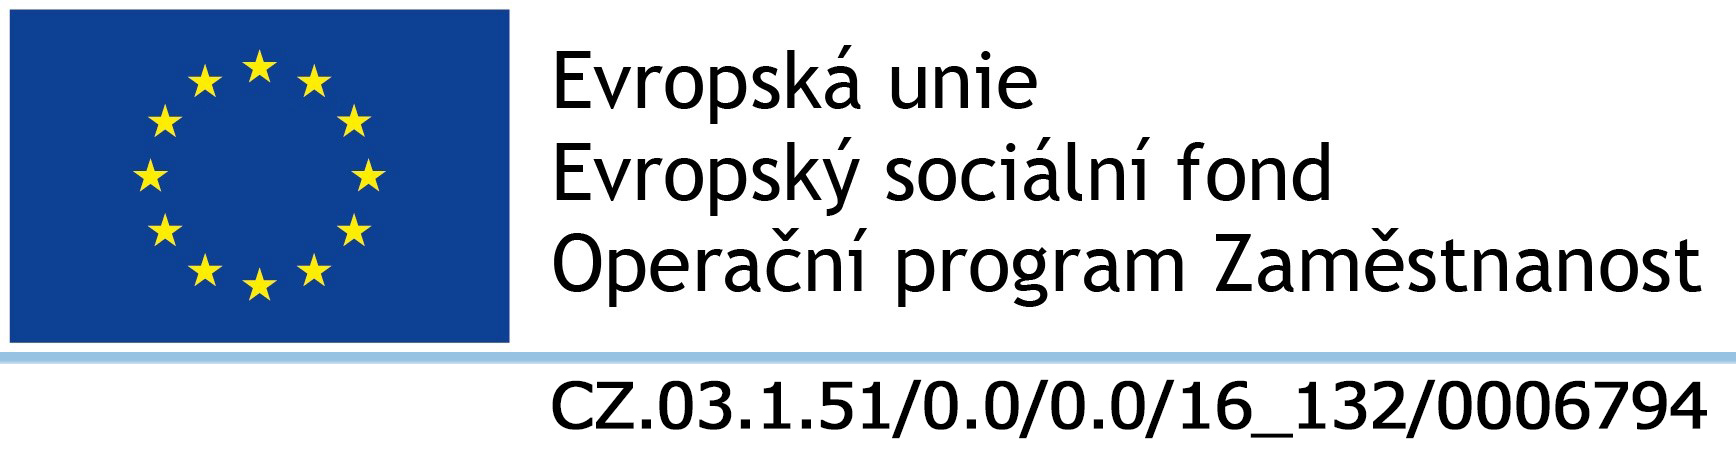 Dětská skupina Meteorka Brno